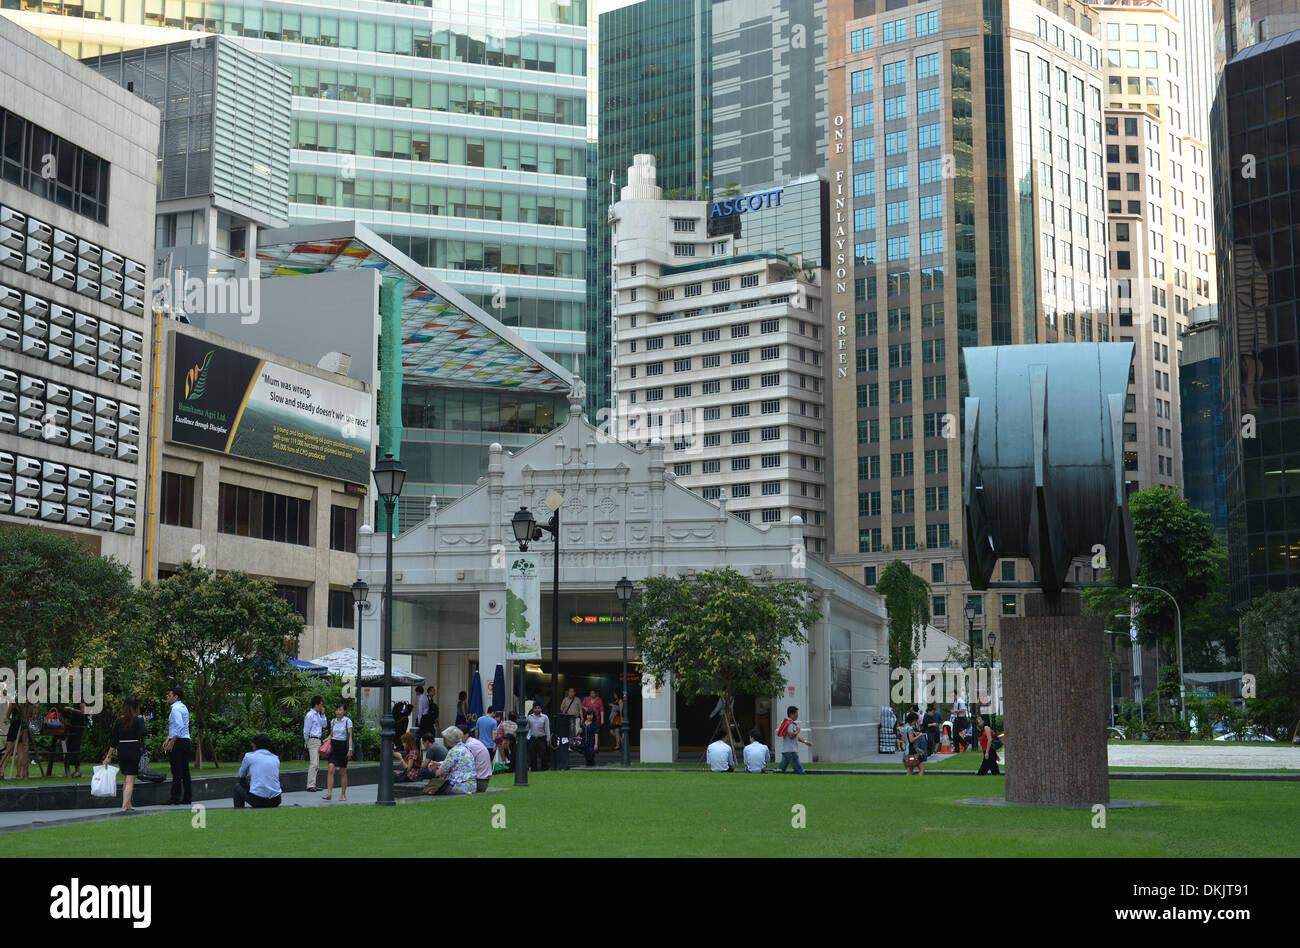 Geschaeftsviertel, Raffles Place, Singapur / Geschäftsviertel - Stock Image